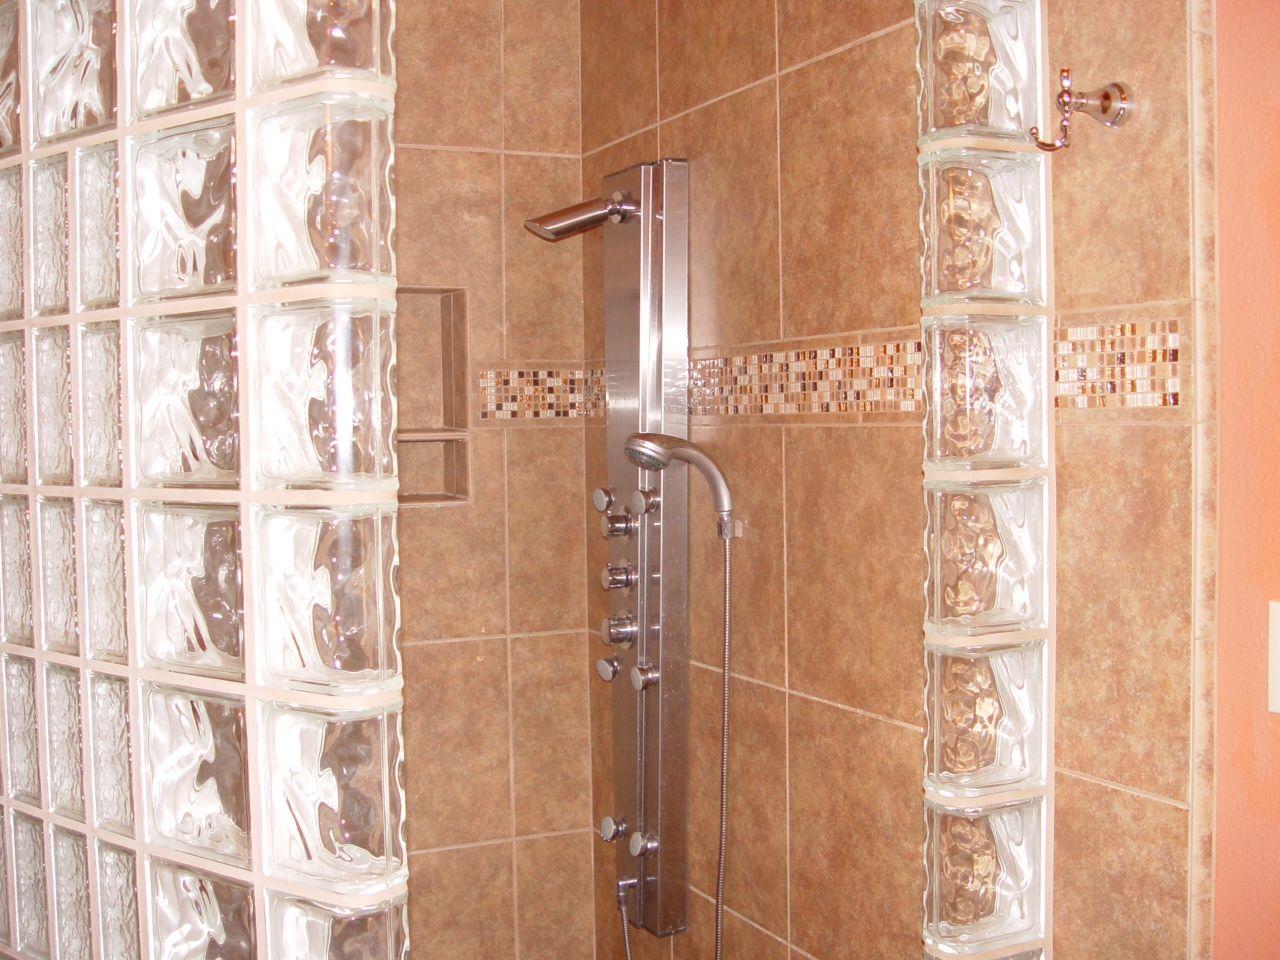 Mosiac Tile With Shower Panel And Glass Block Custom Shower. Design By Lori  Harakal Sedona